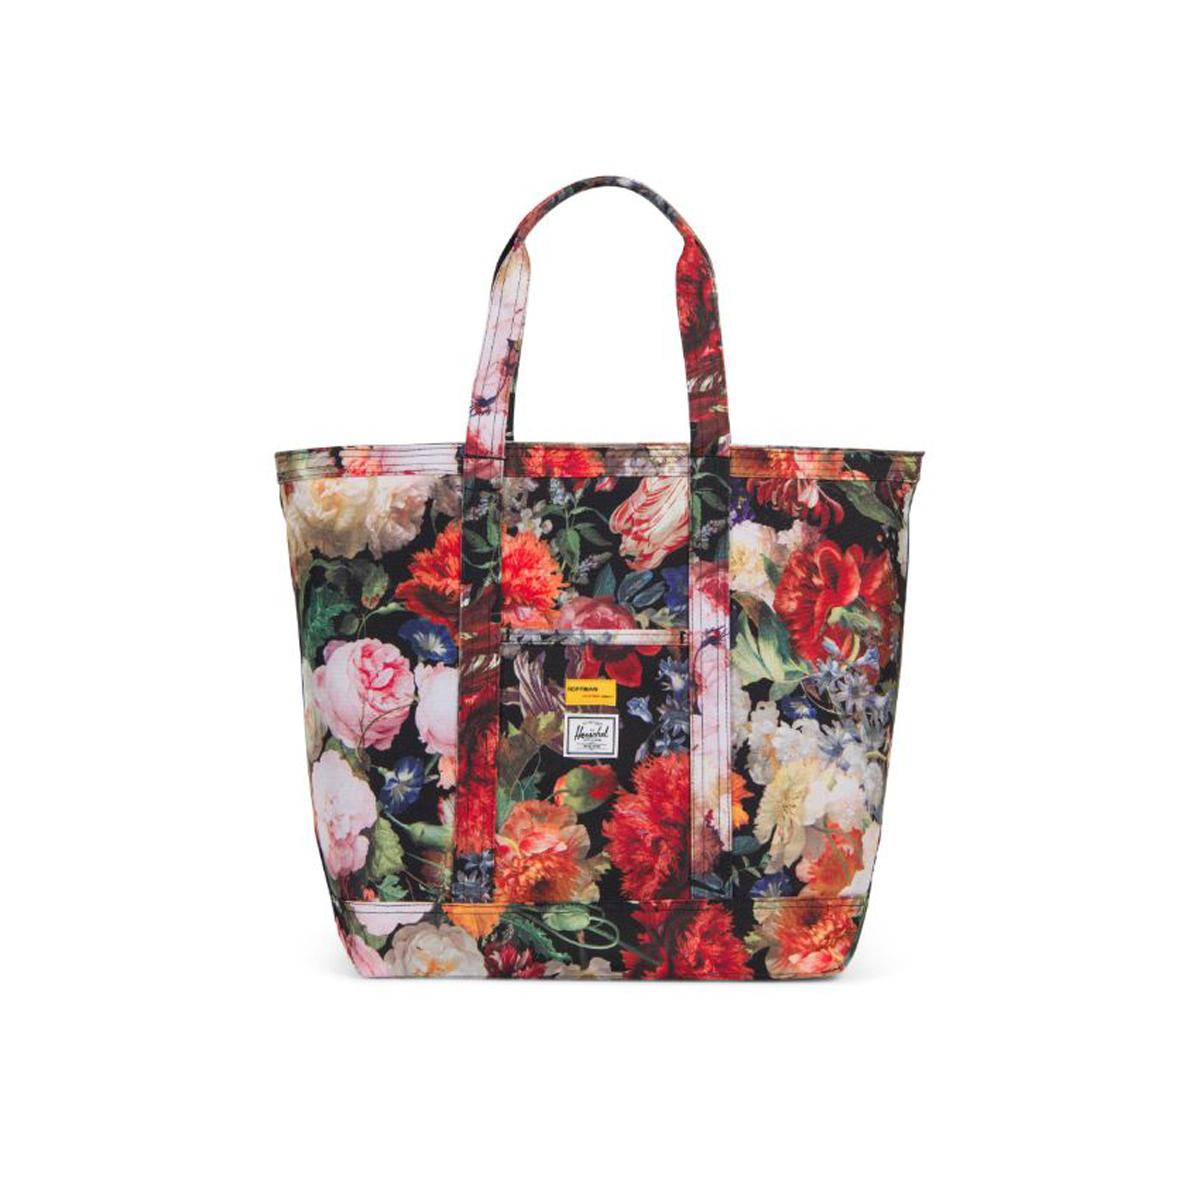 0fb40c7d5c Hershel supply Herschel Supply regular store tote bag BAMFIELD MID-VOLUME TOTE  BAG 10318-02222-OS FALL FLORAL